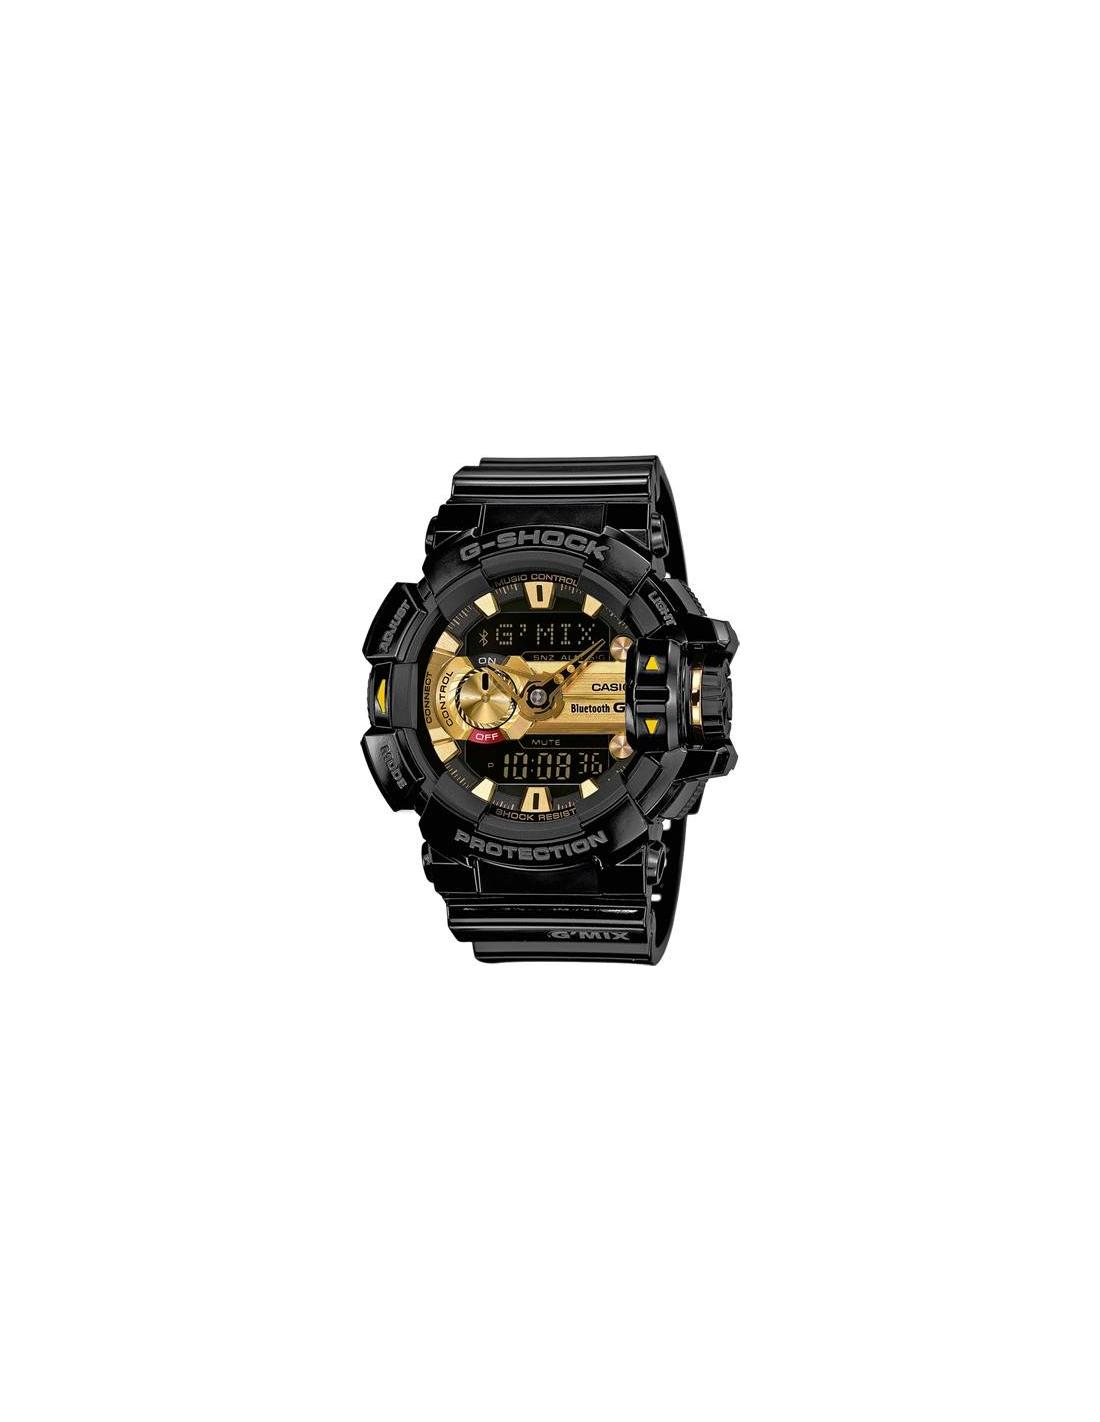 Montre Homme Casio G Shock GBA 400 1A9ER Noir à 229,00  jNXYi